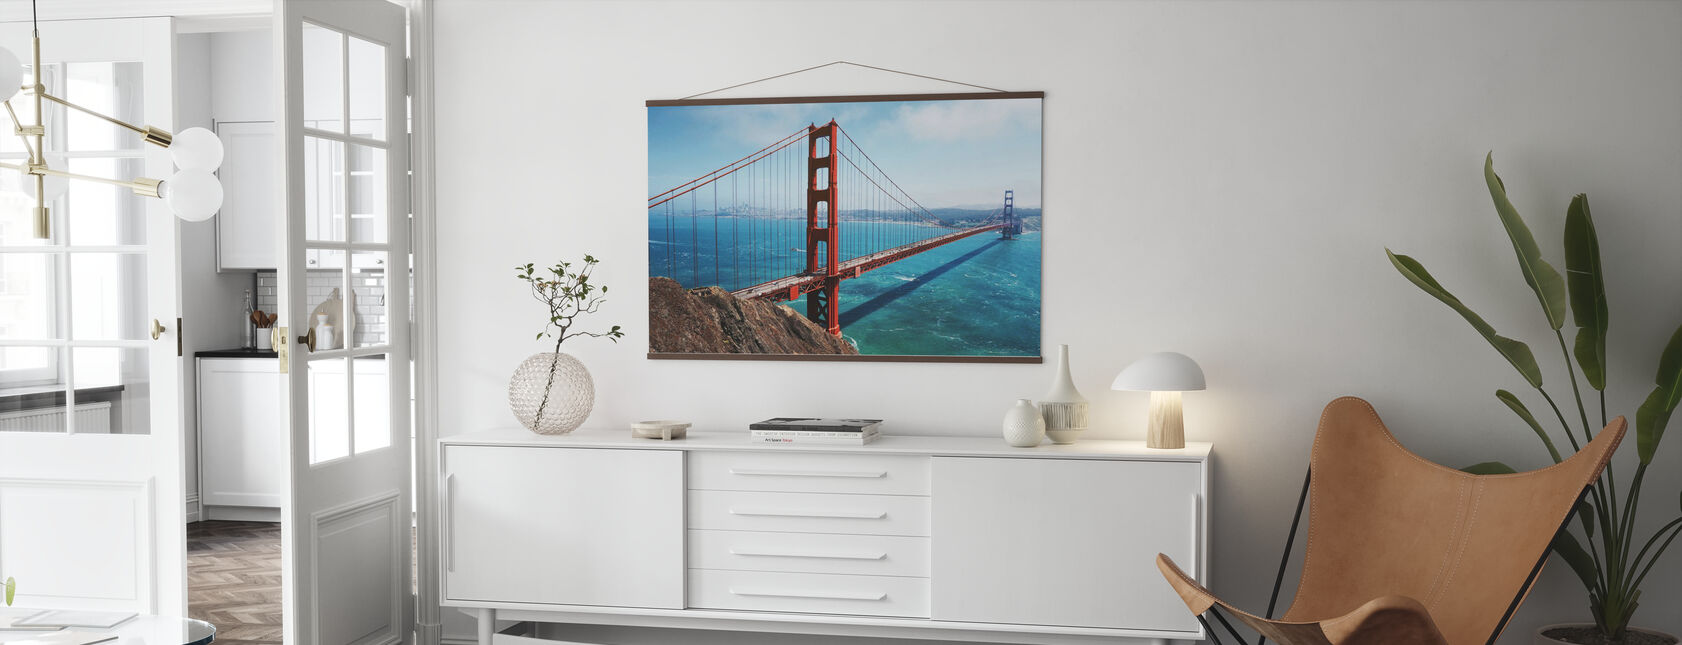 Ponte Golden Gate - Poster - Salotto